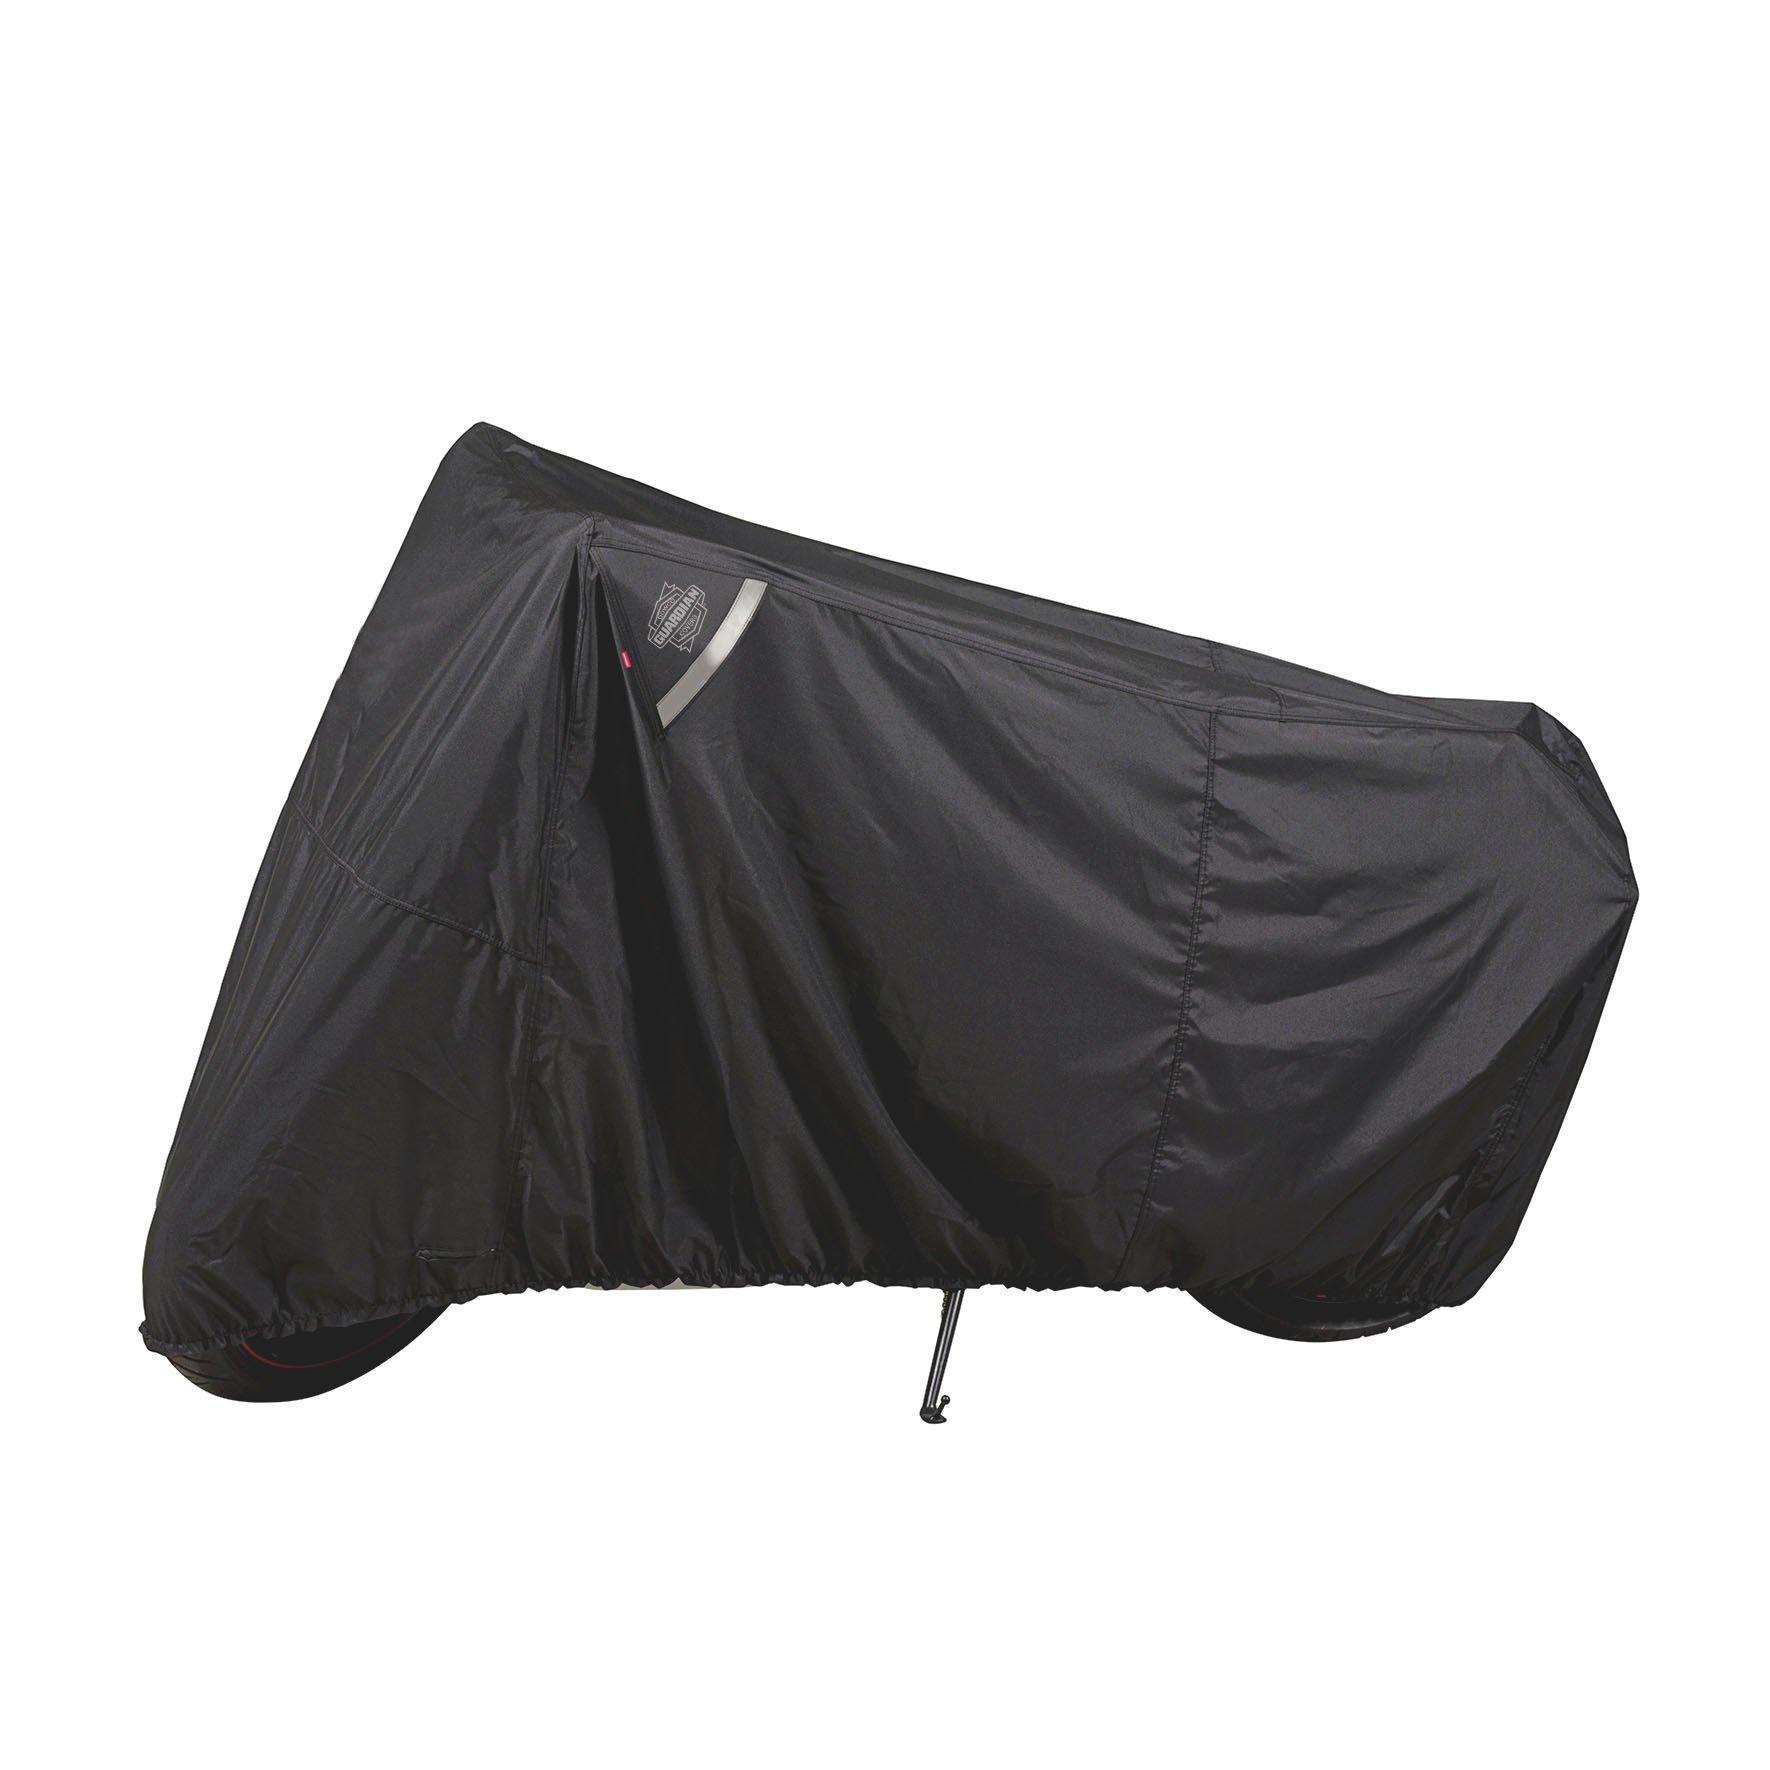 Dowco Guardian by 50124-00 WeatherAll Plus Indoor/Outdoor Waterproof Motorcycle Cover: Black, Sportbike